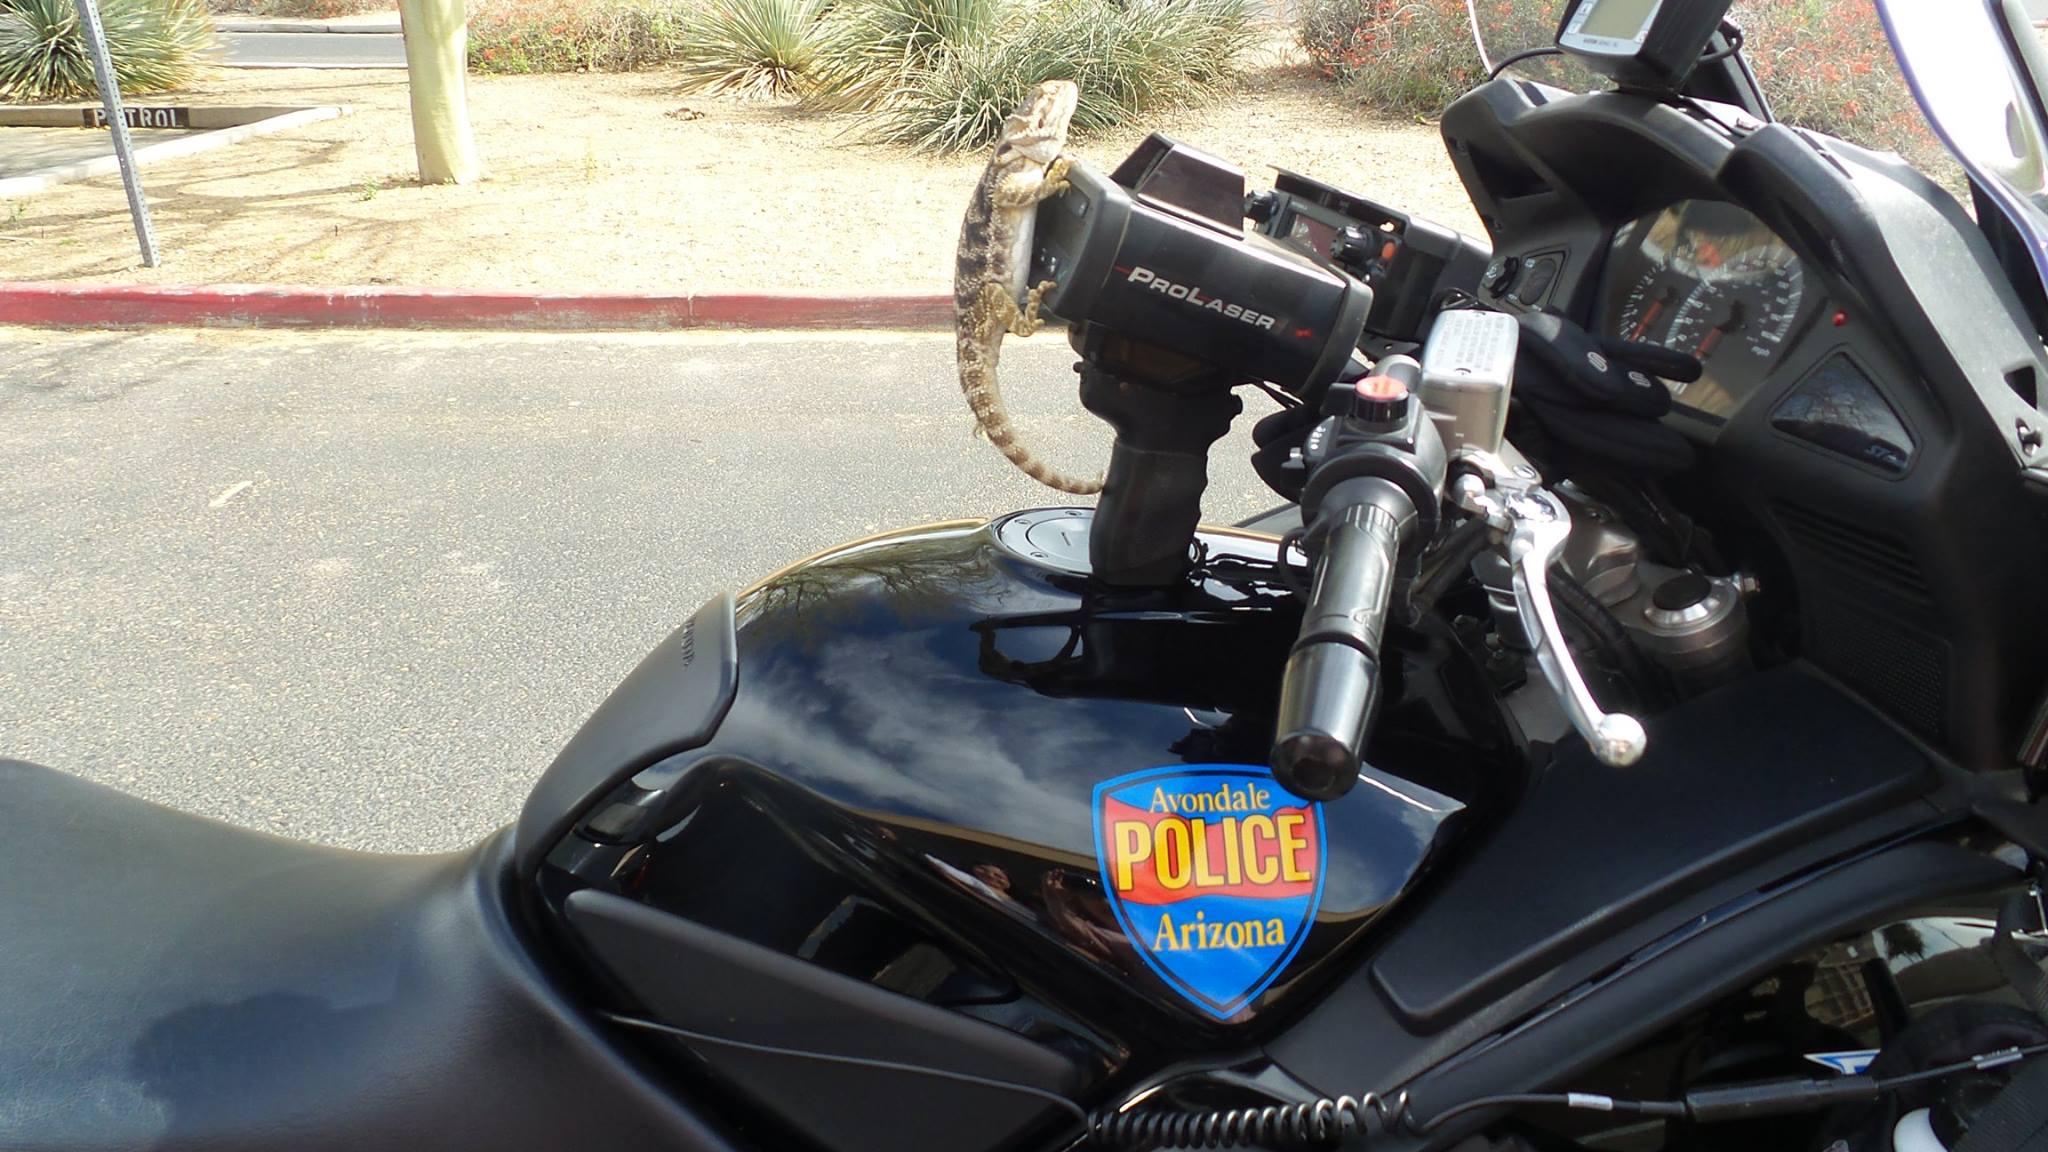 Iroh 'running radar with Motors' (Source: Avondale Police Department via Facebook)